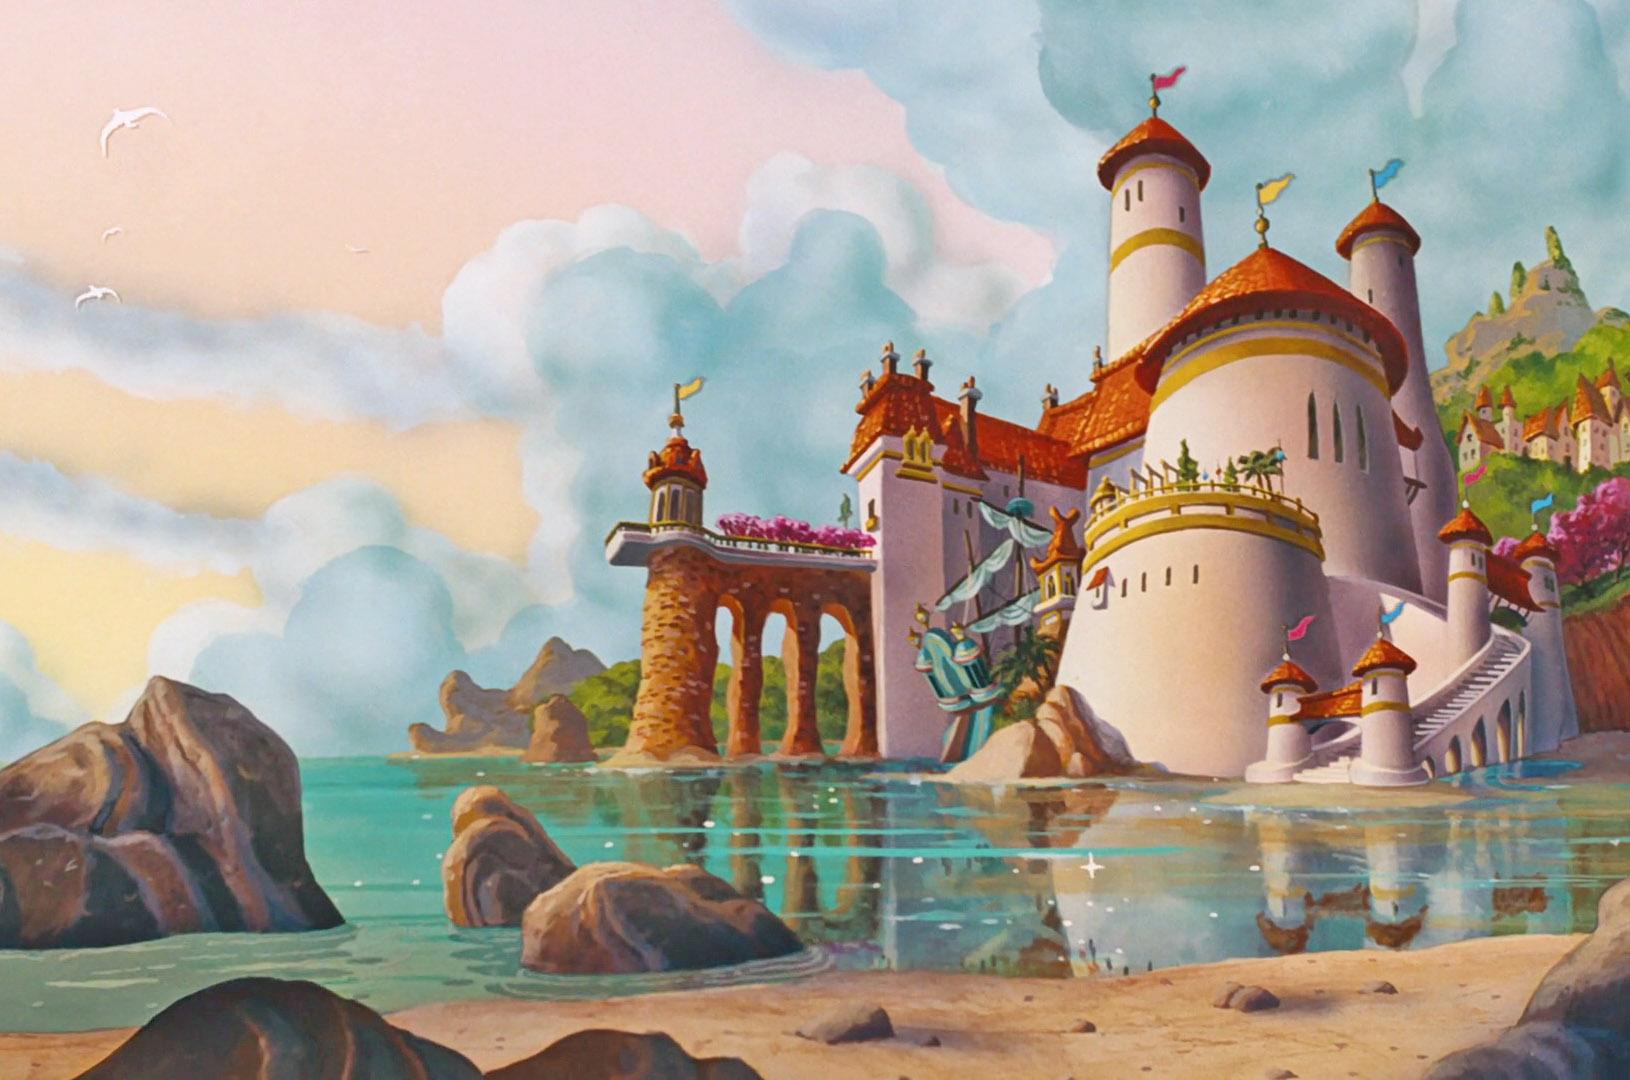 Fairytale Travel: The real life Little Mermaid Castle